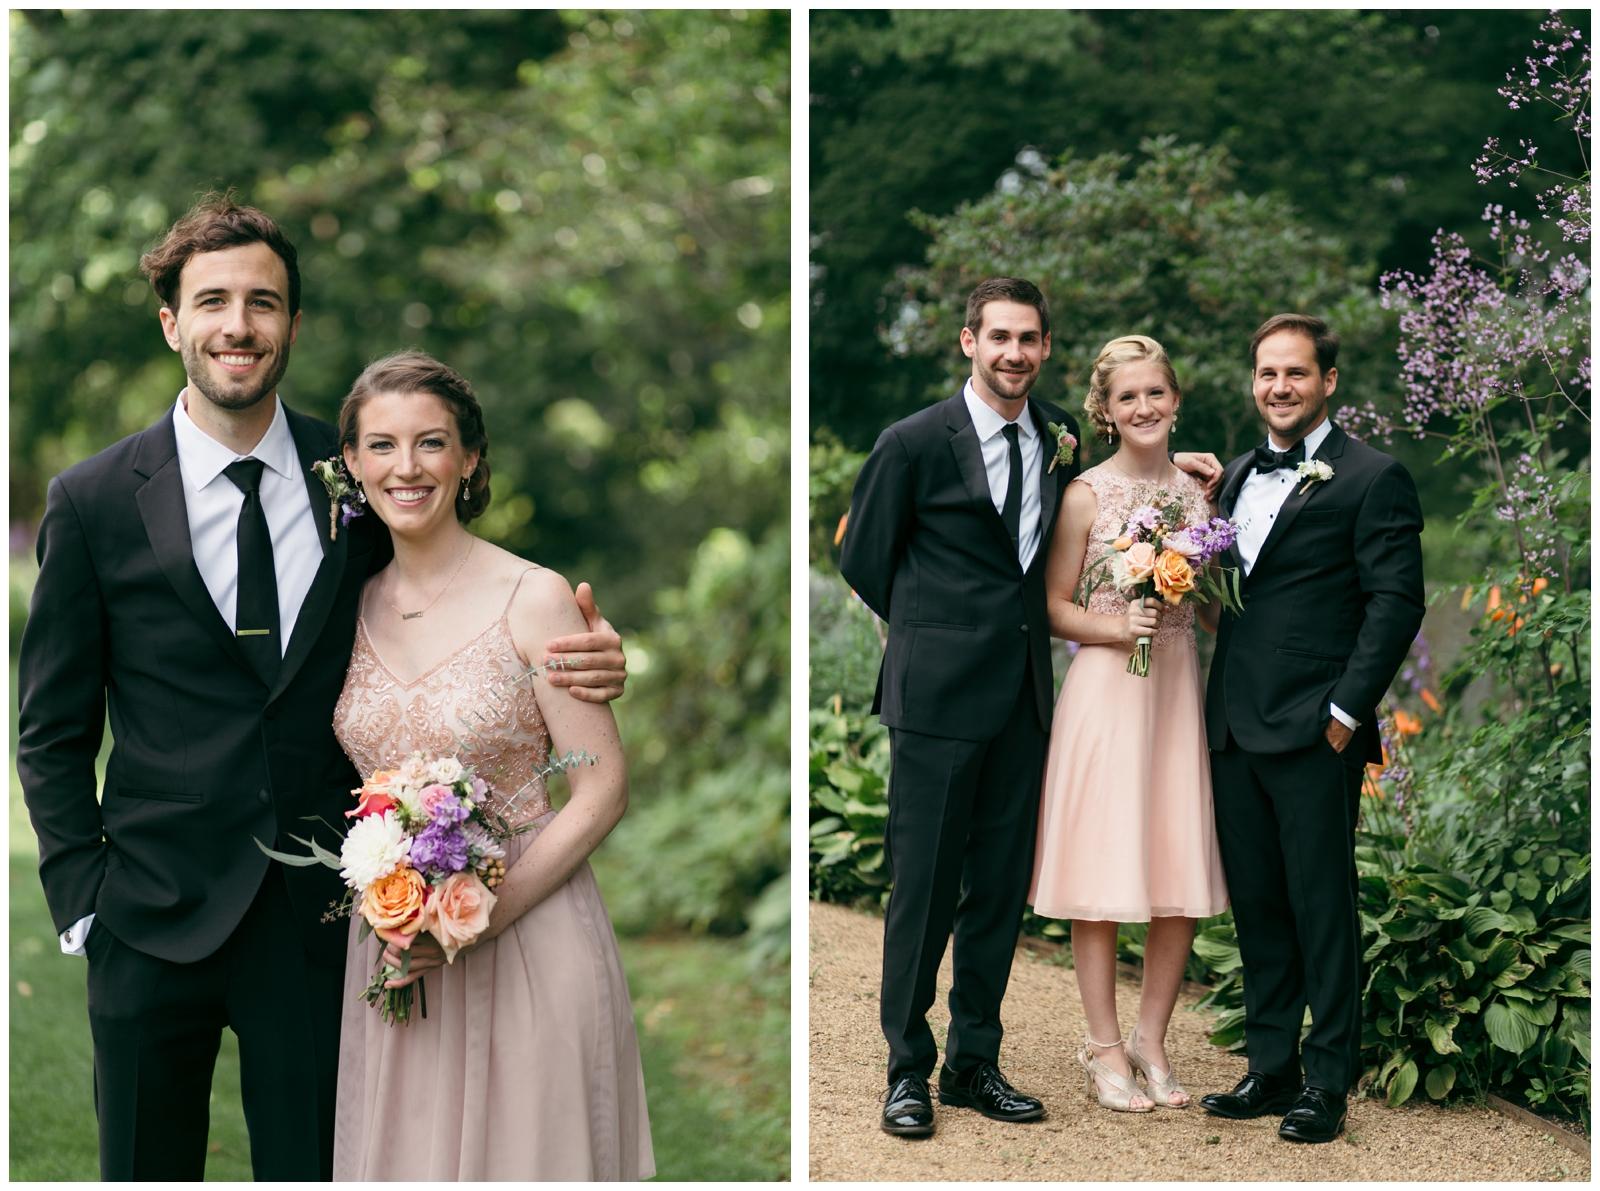 Moraine-Farm-wedding-Bailey-Q-Photo-Massachusetts-wedding-photpgrapher-044.jpg